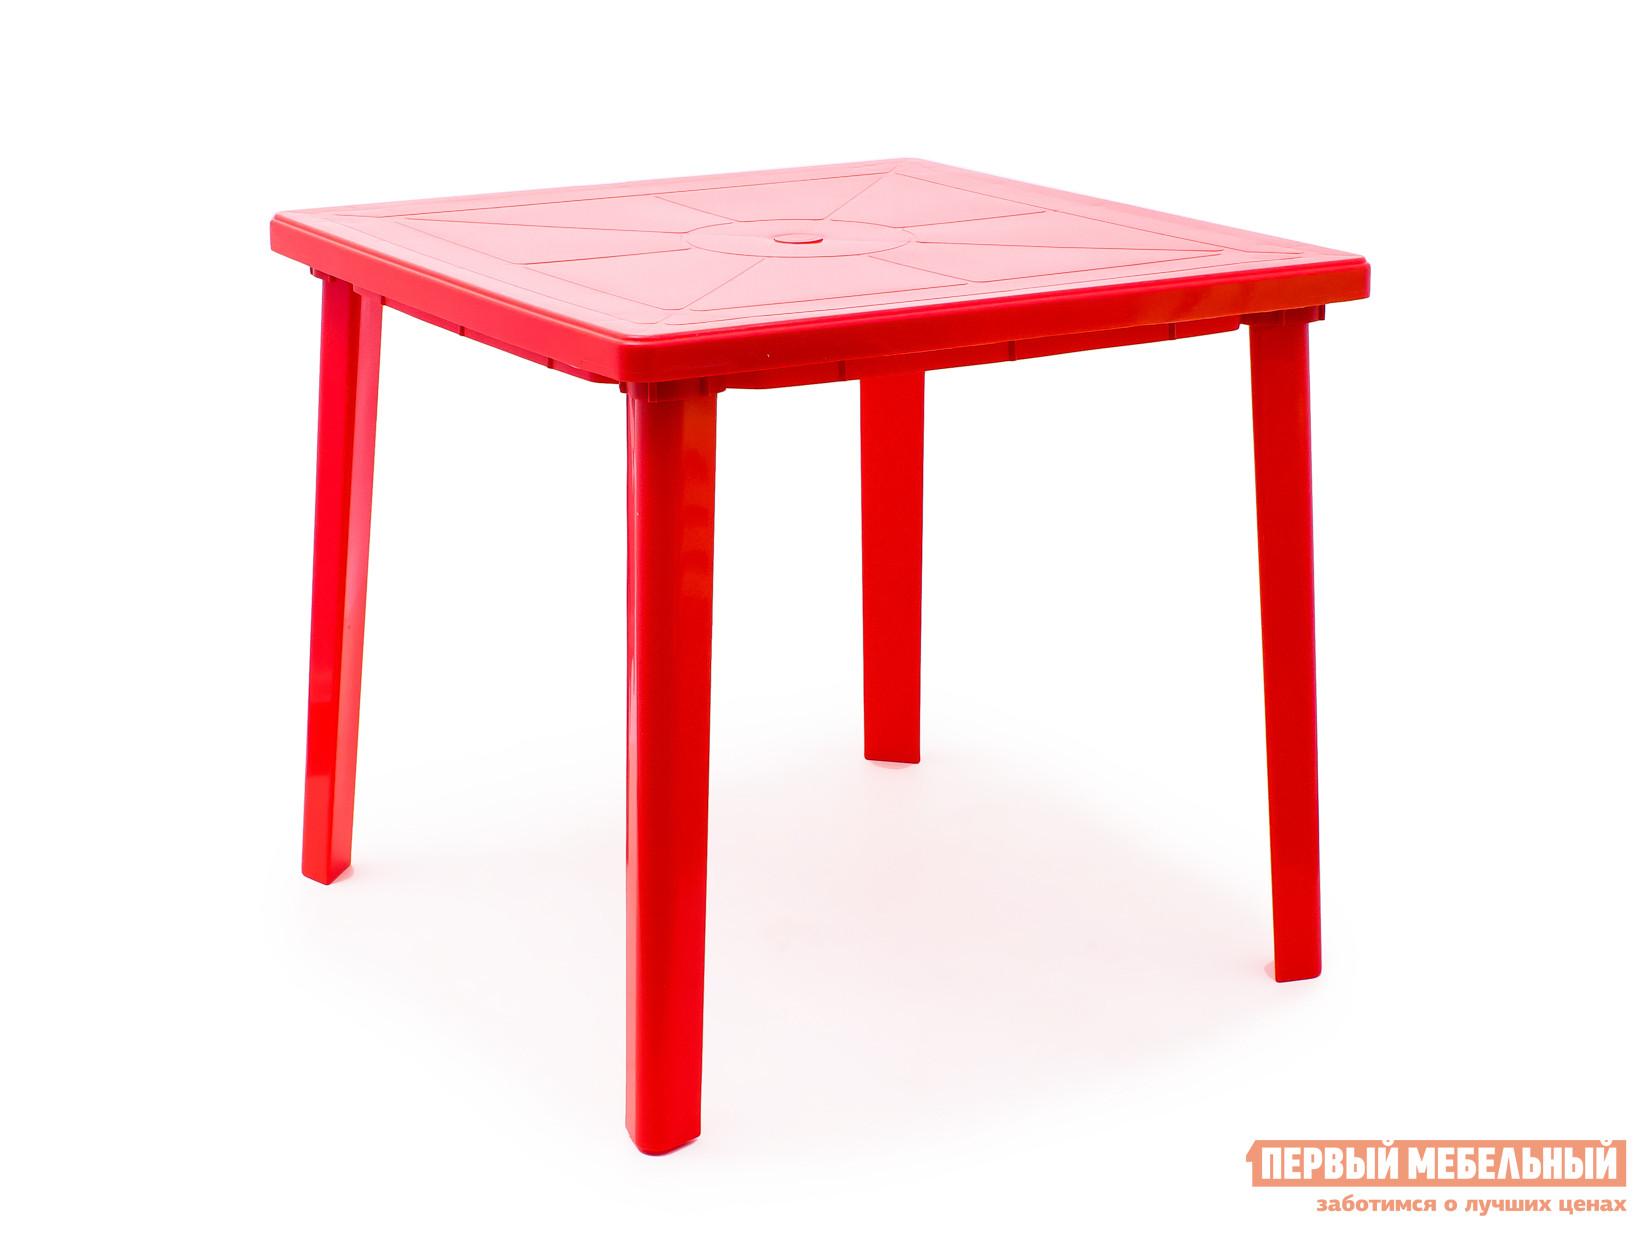 Пластиковый стол Стандарт Пластик Стол квадратный (800х800х710) Красный